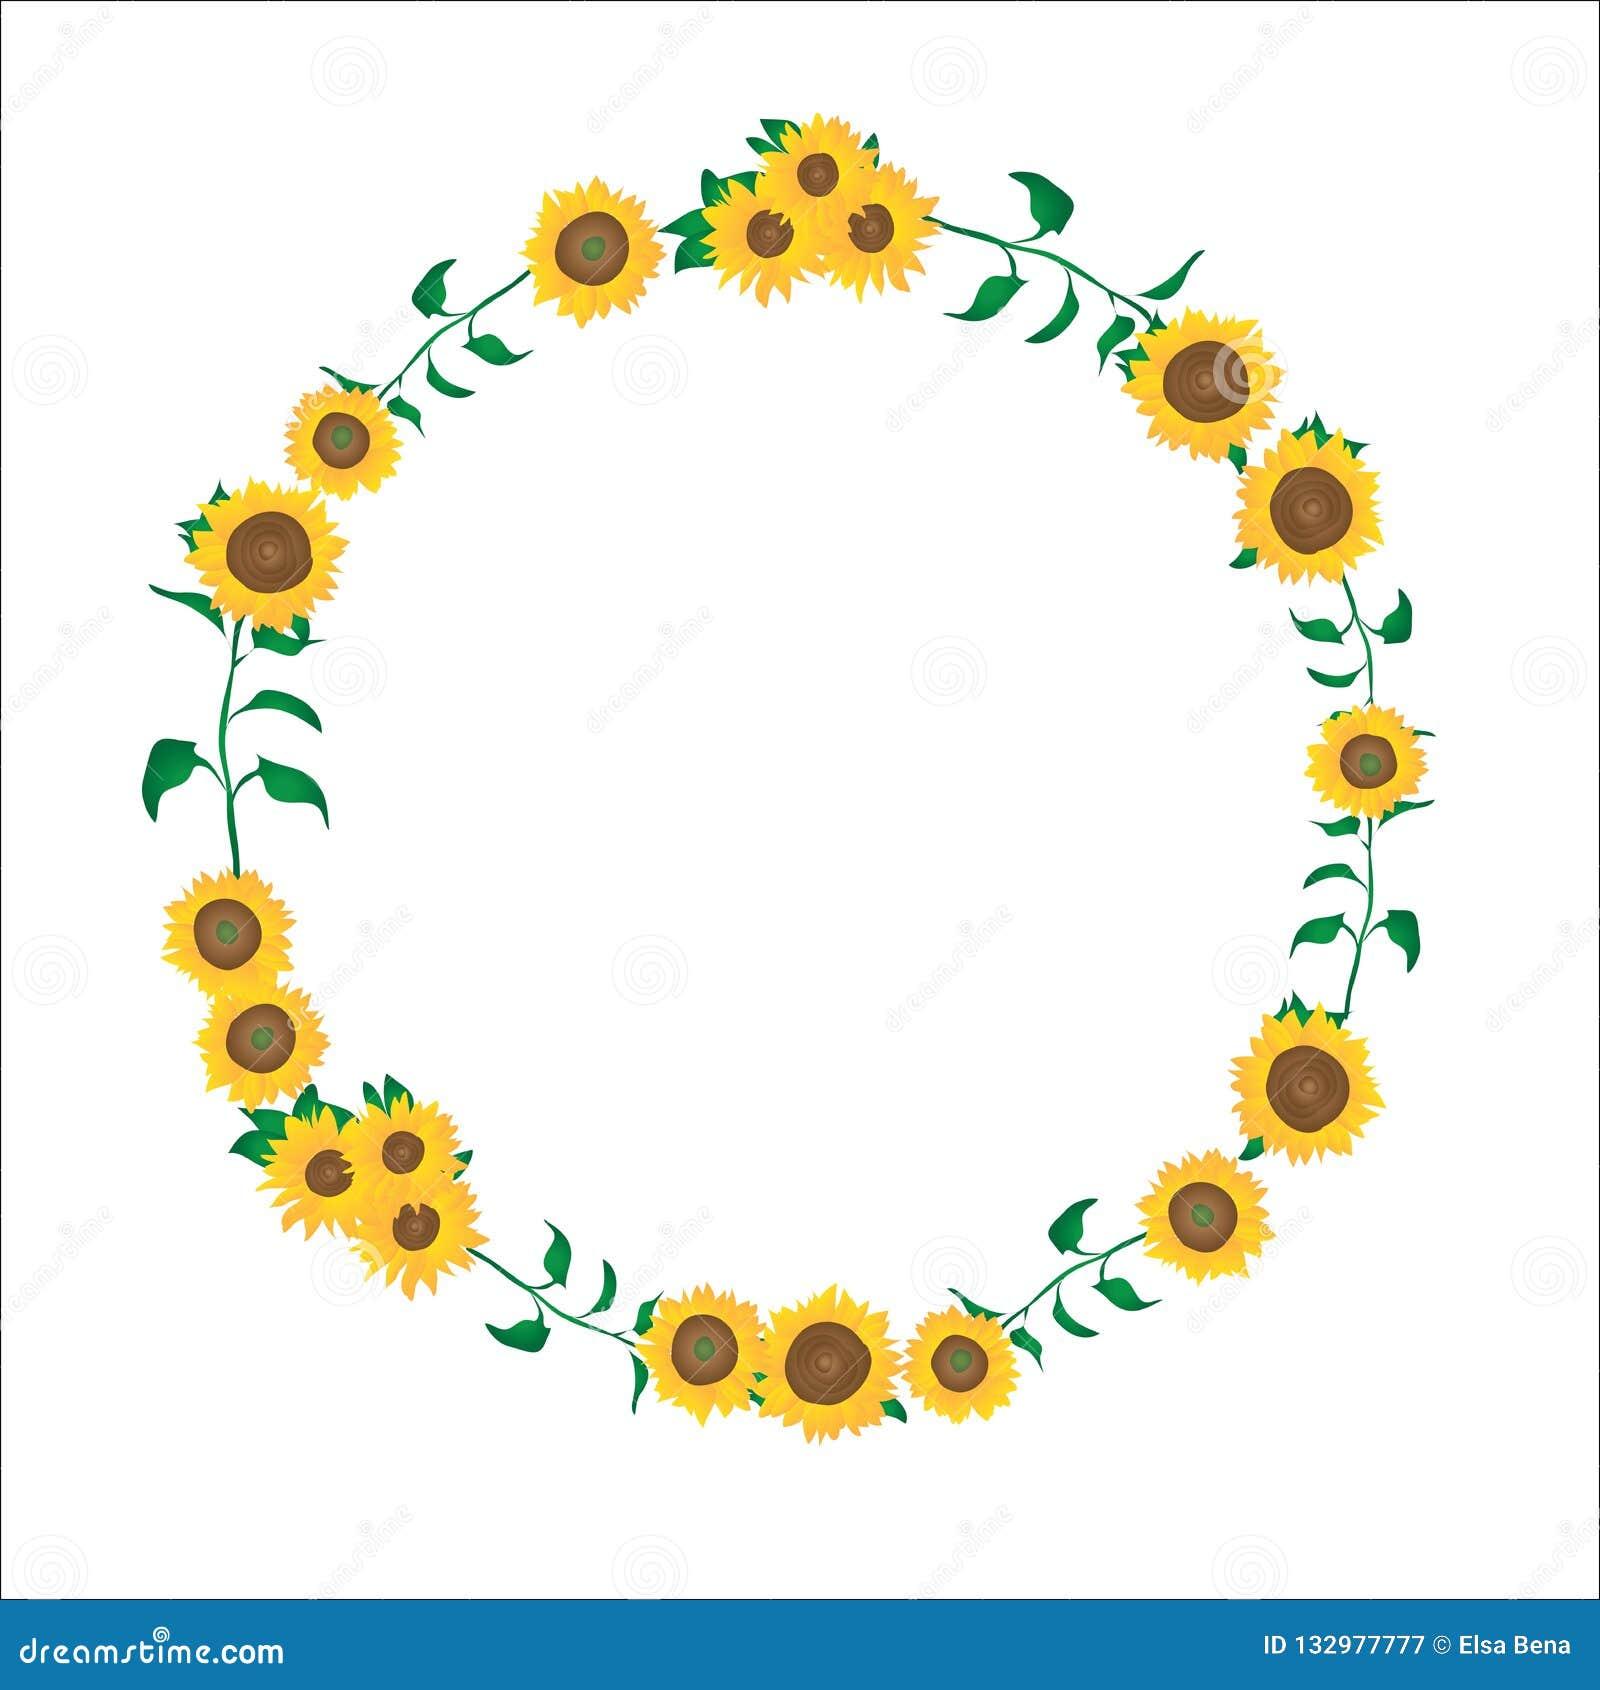 Circle Template | Simple Sunflowers Flower Circle Border Template Stock Illustration